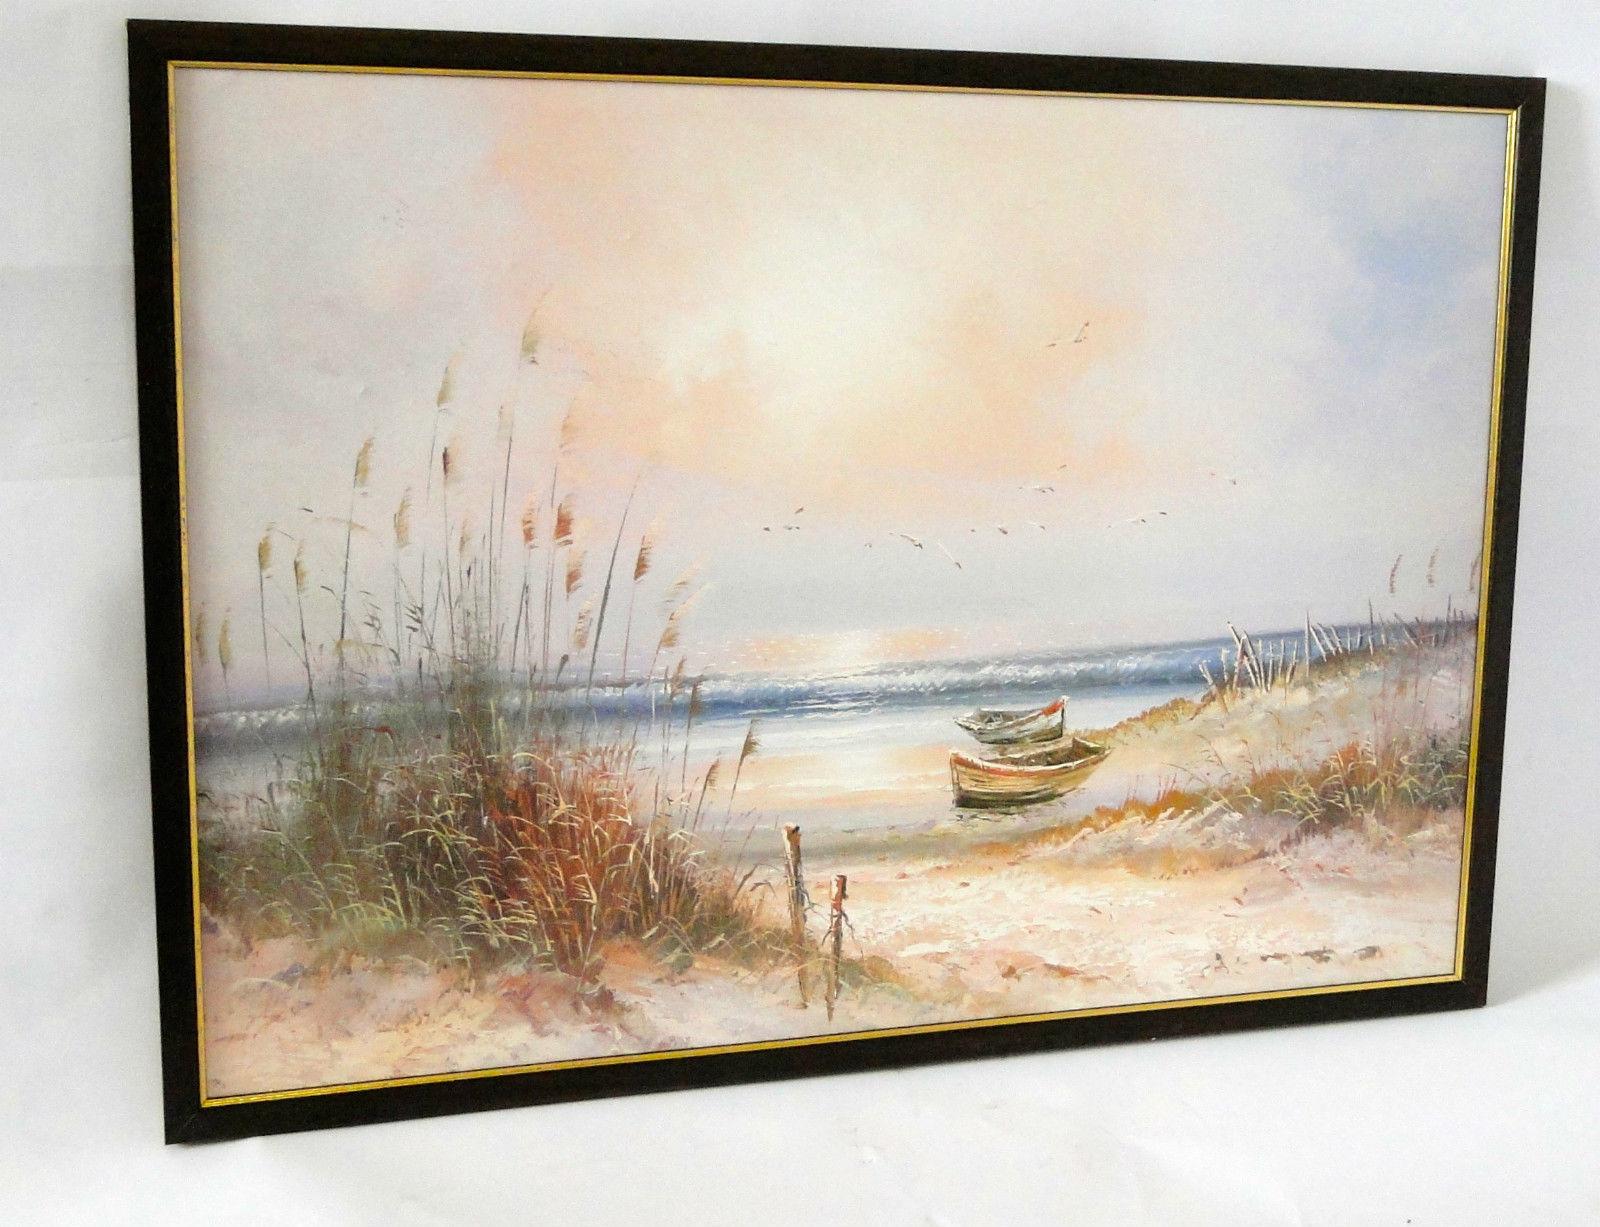 Gemälde Ölbilder Deko Holzrahmen 50x70 Bilder Poster Bilderrahmen ...